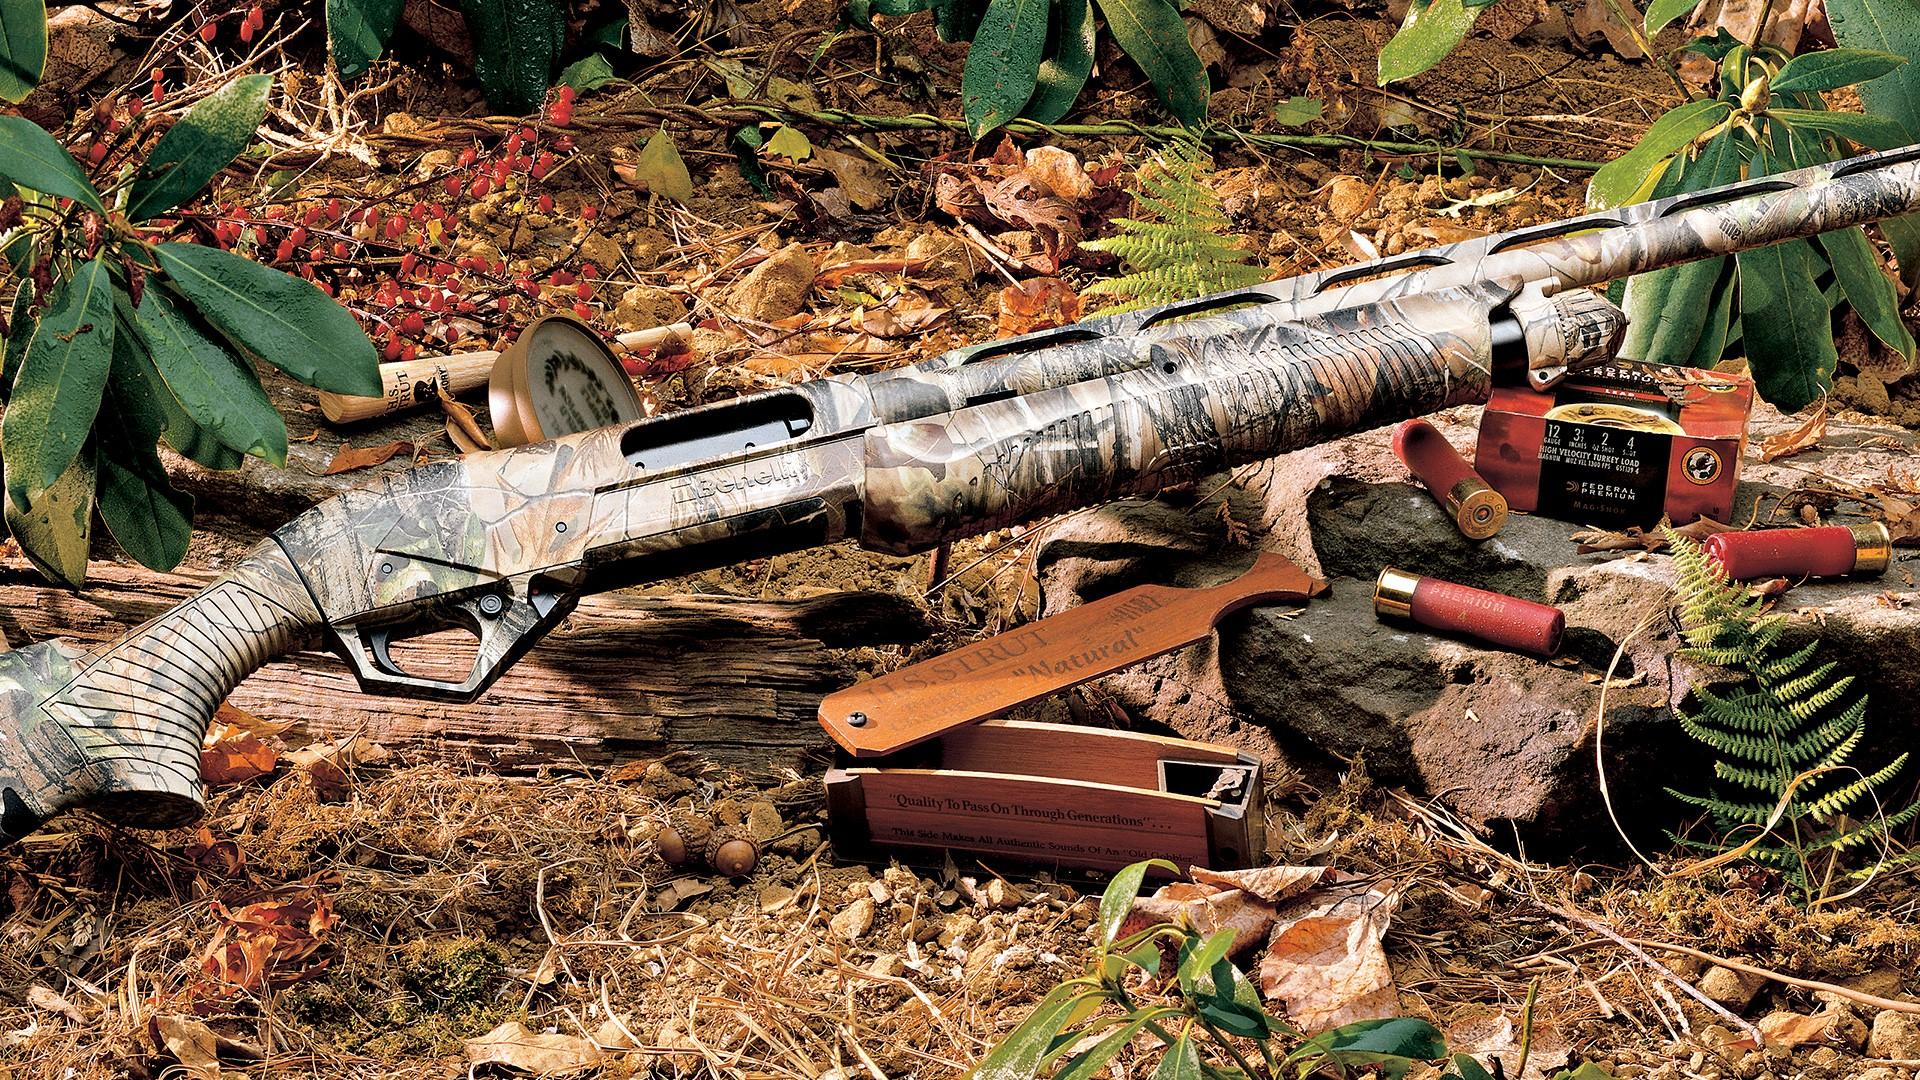 Shotgun for Hunting in Jungle HD Desktop Images HD Wallpapers 1920x1080